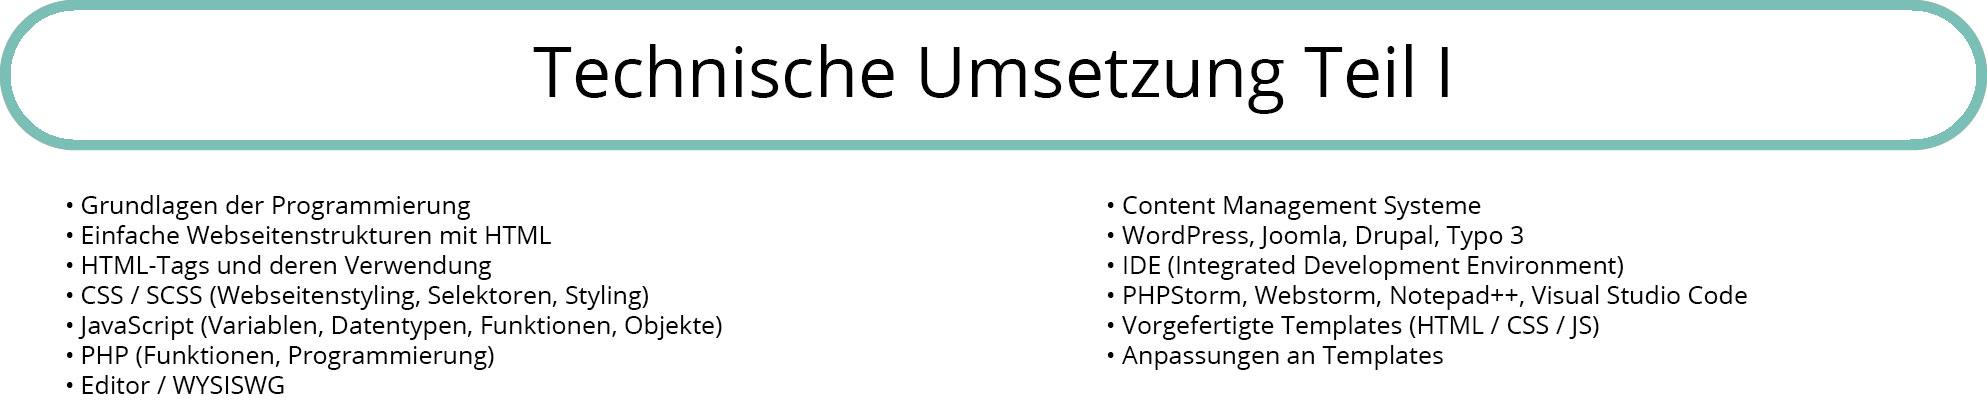 Webdesigner_Kurs_Ausbildung_Webseiten_Design_Agentur_15